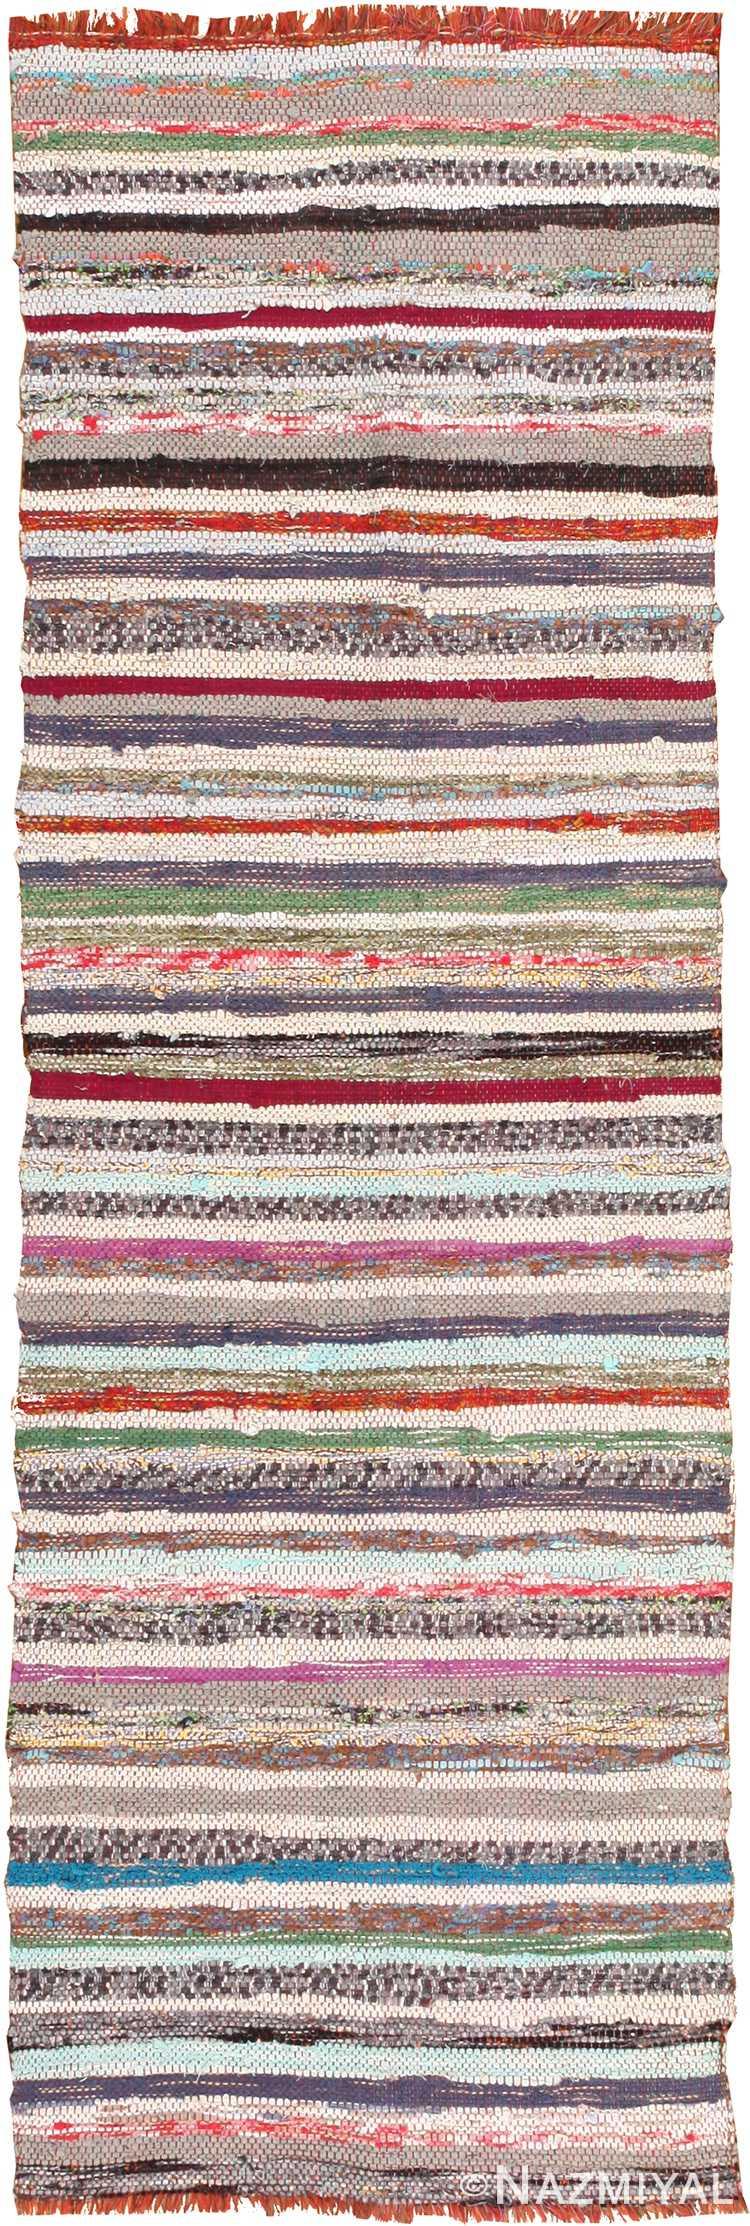 Small Long And Narrow Vintage Swedish Rag Rug #46658 by Nazmiyal Antique Rugs